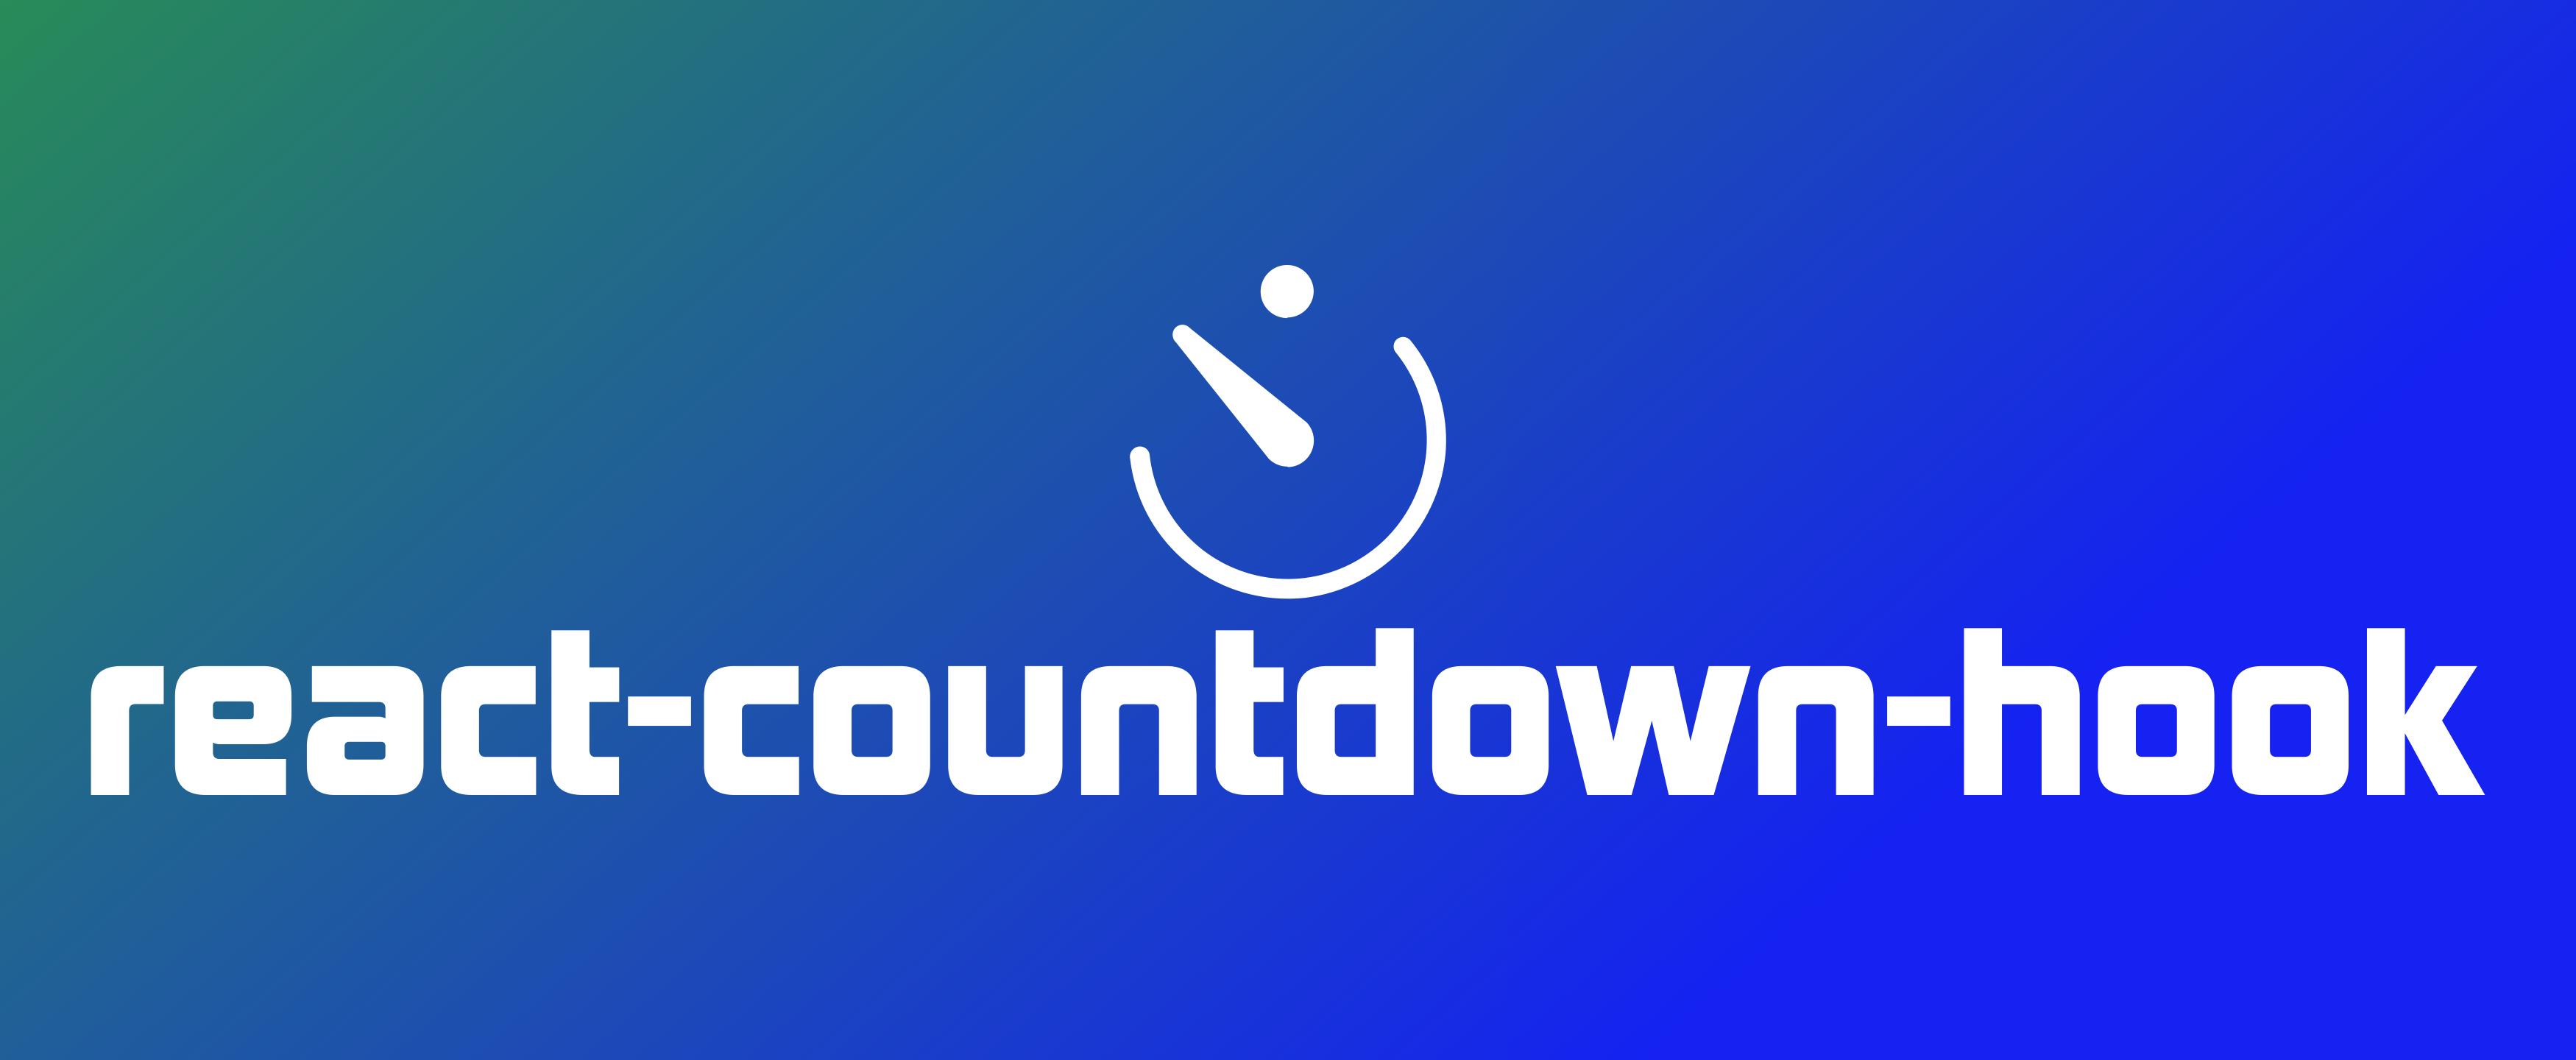 react-countdown-hook